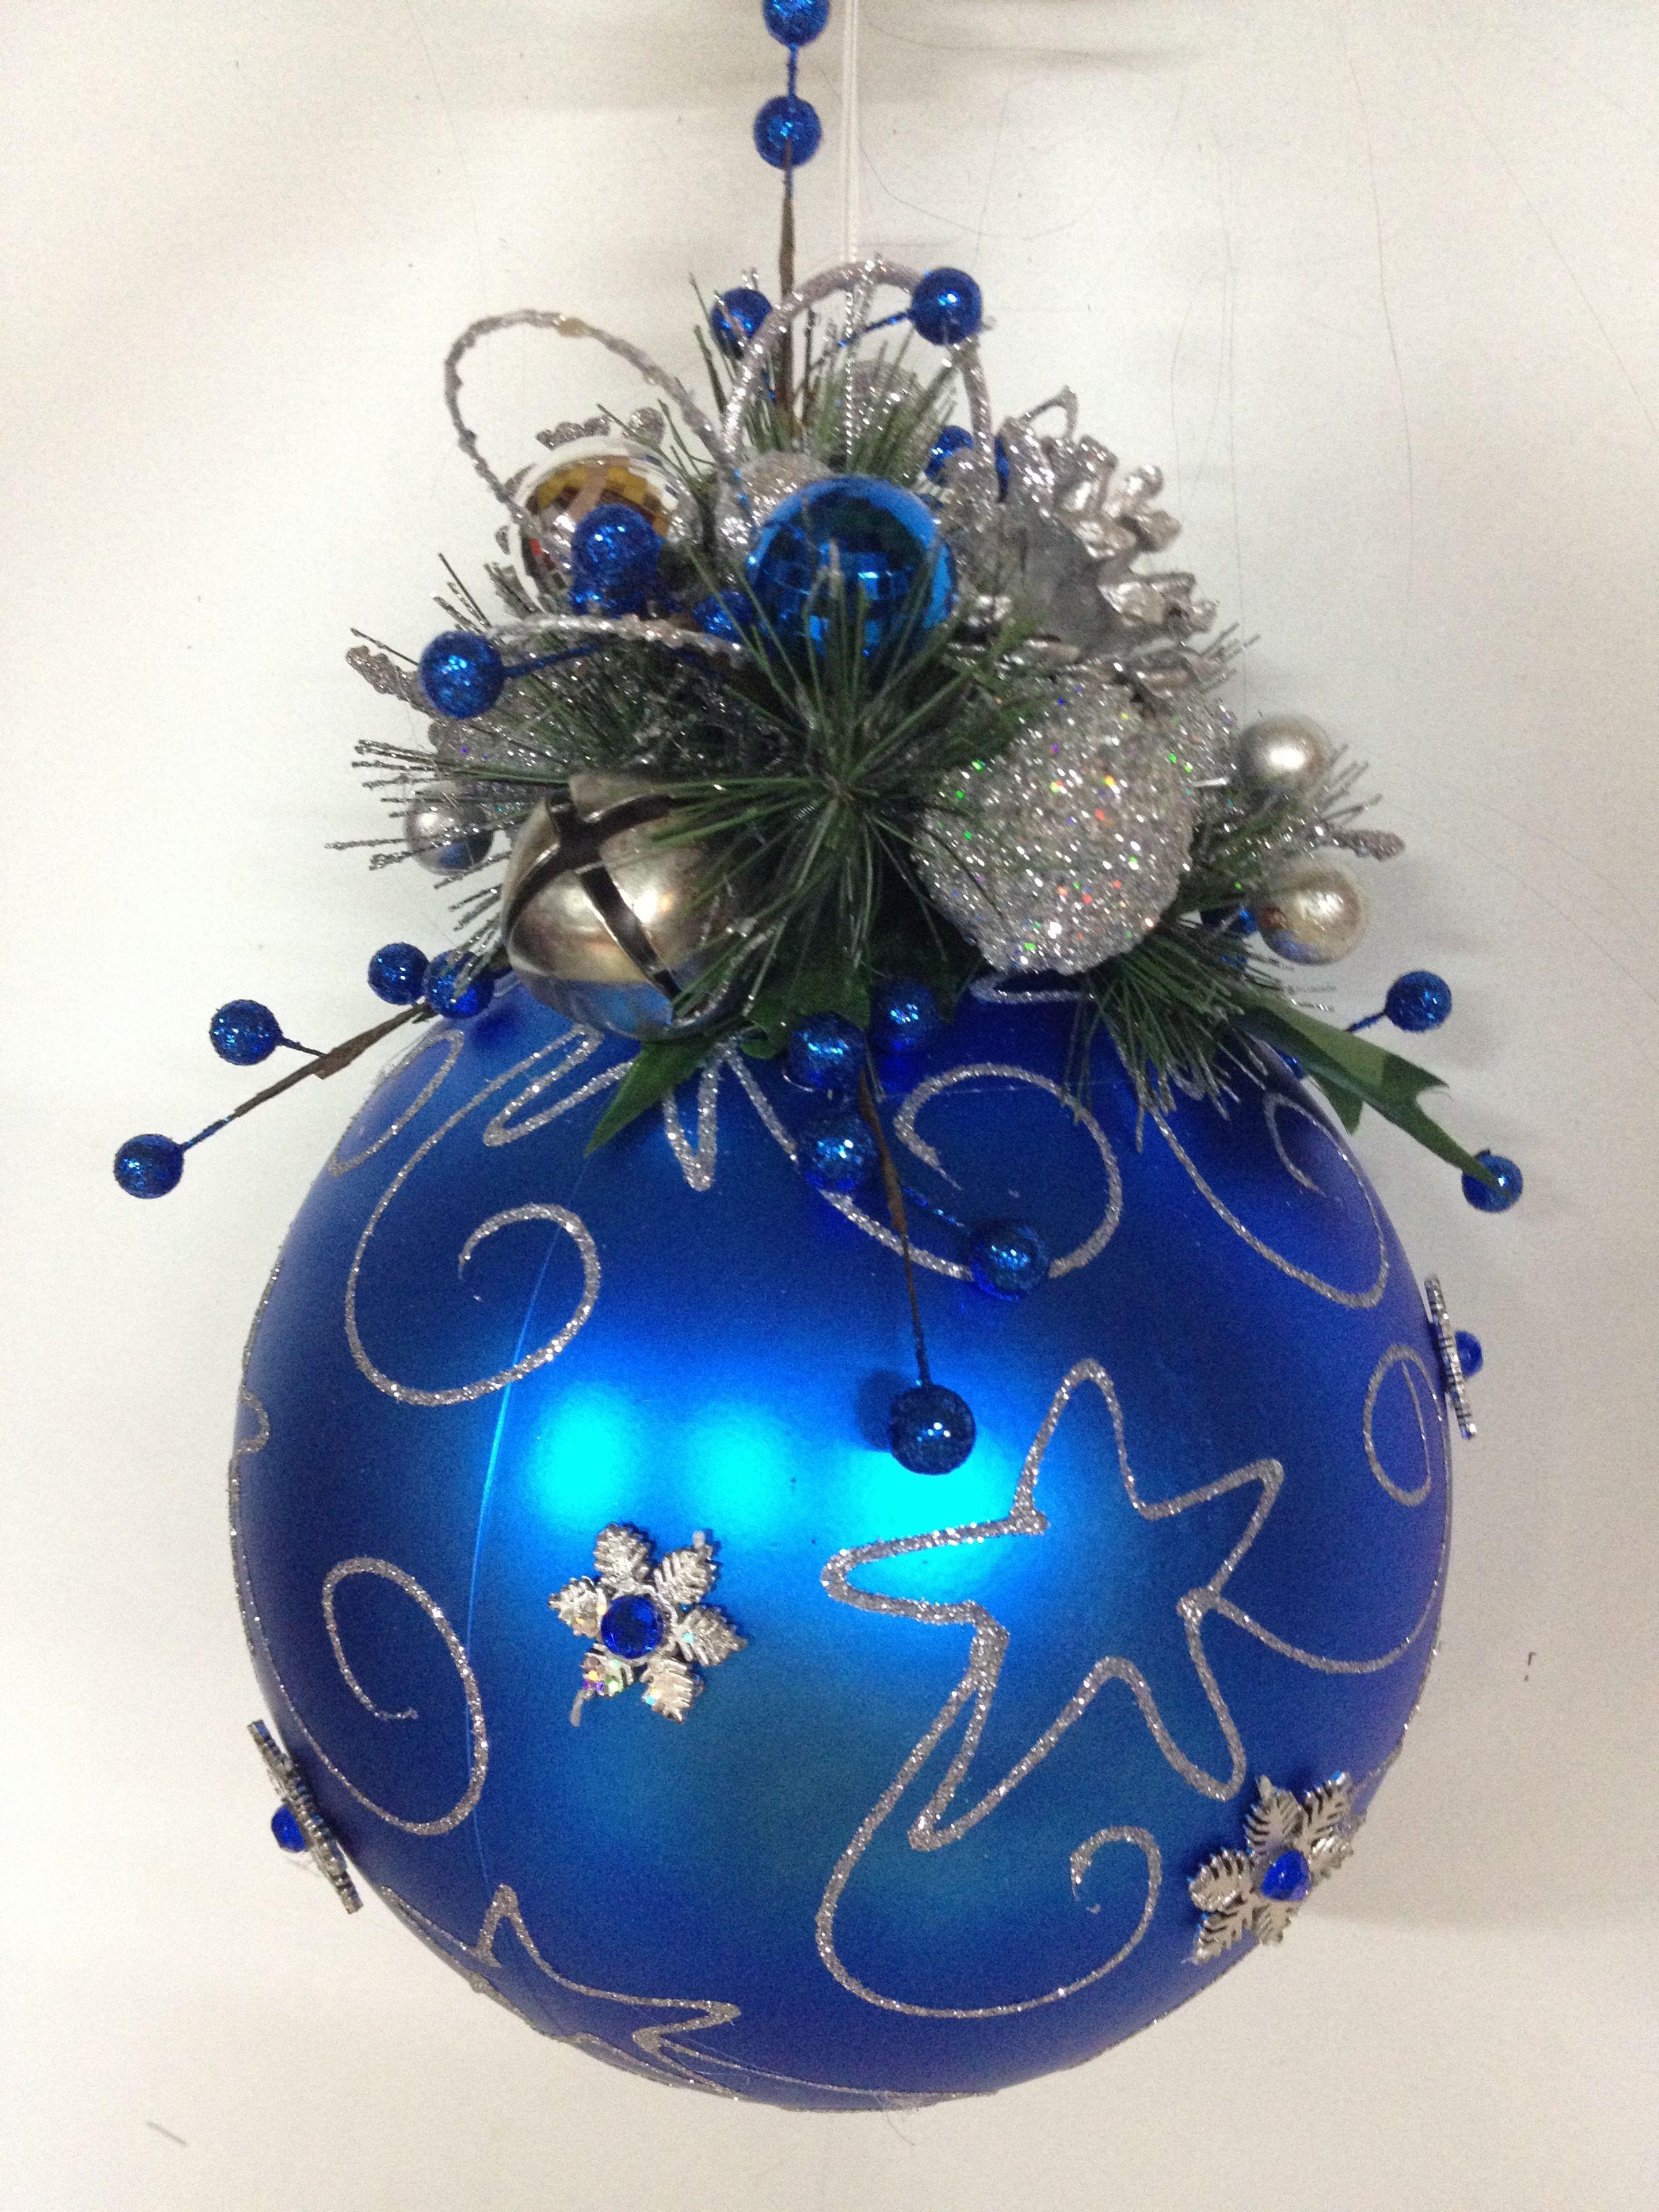 Blue Jingle Ball By Shari Blue Christmas Ornaments Blue Christmas Tree Christmas Ornaments